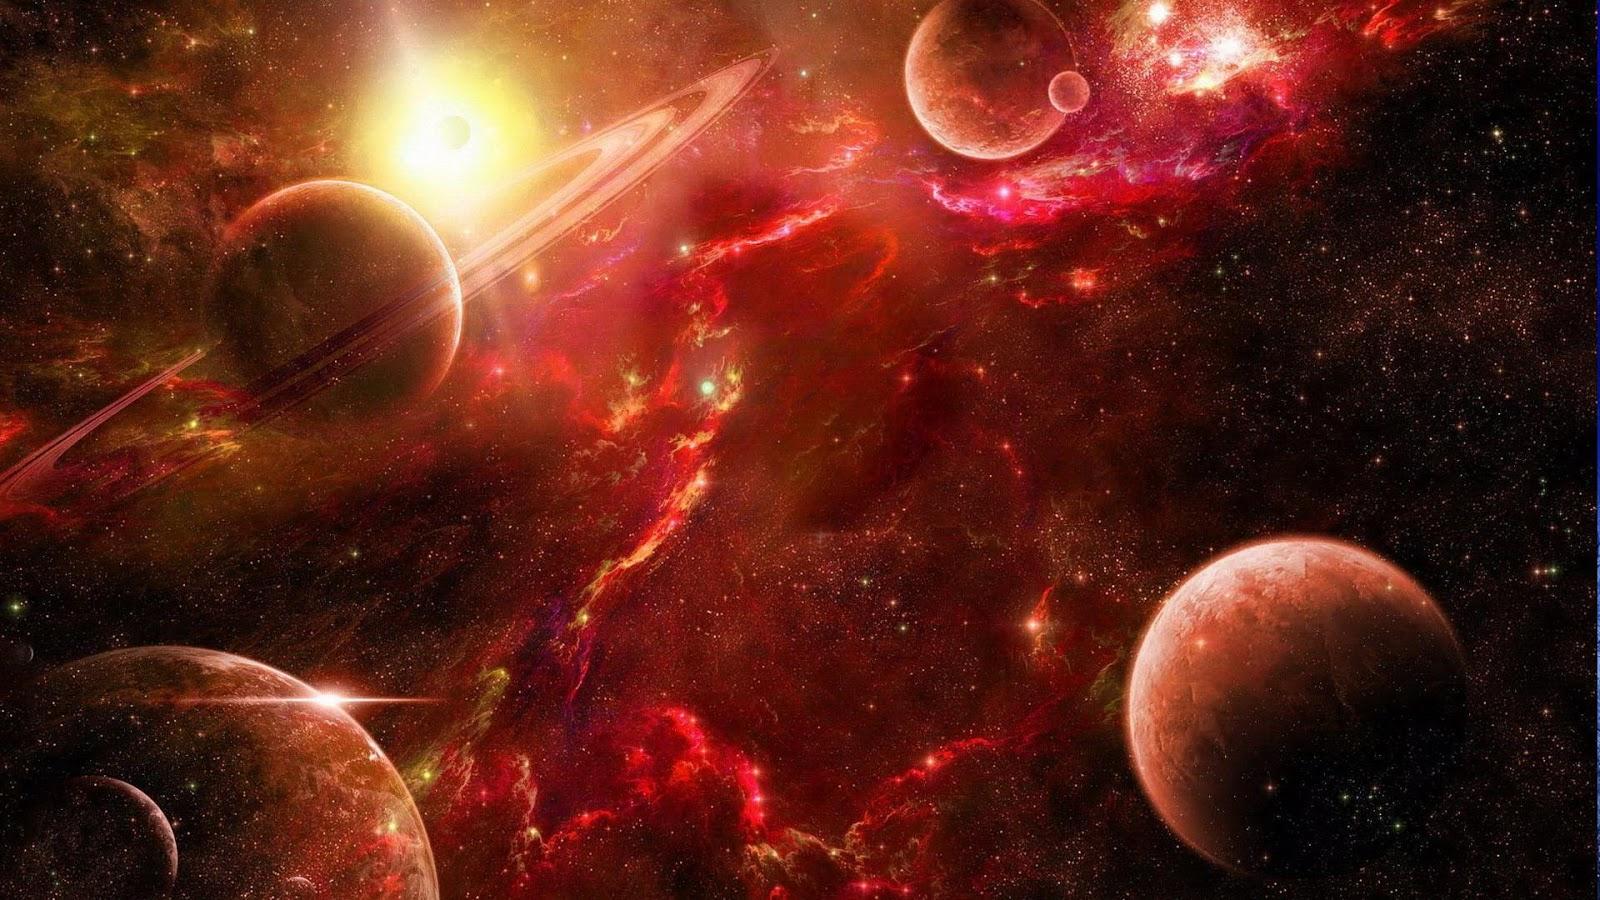 Gmail planets theme - Planets Live Wallpaper Screenshot